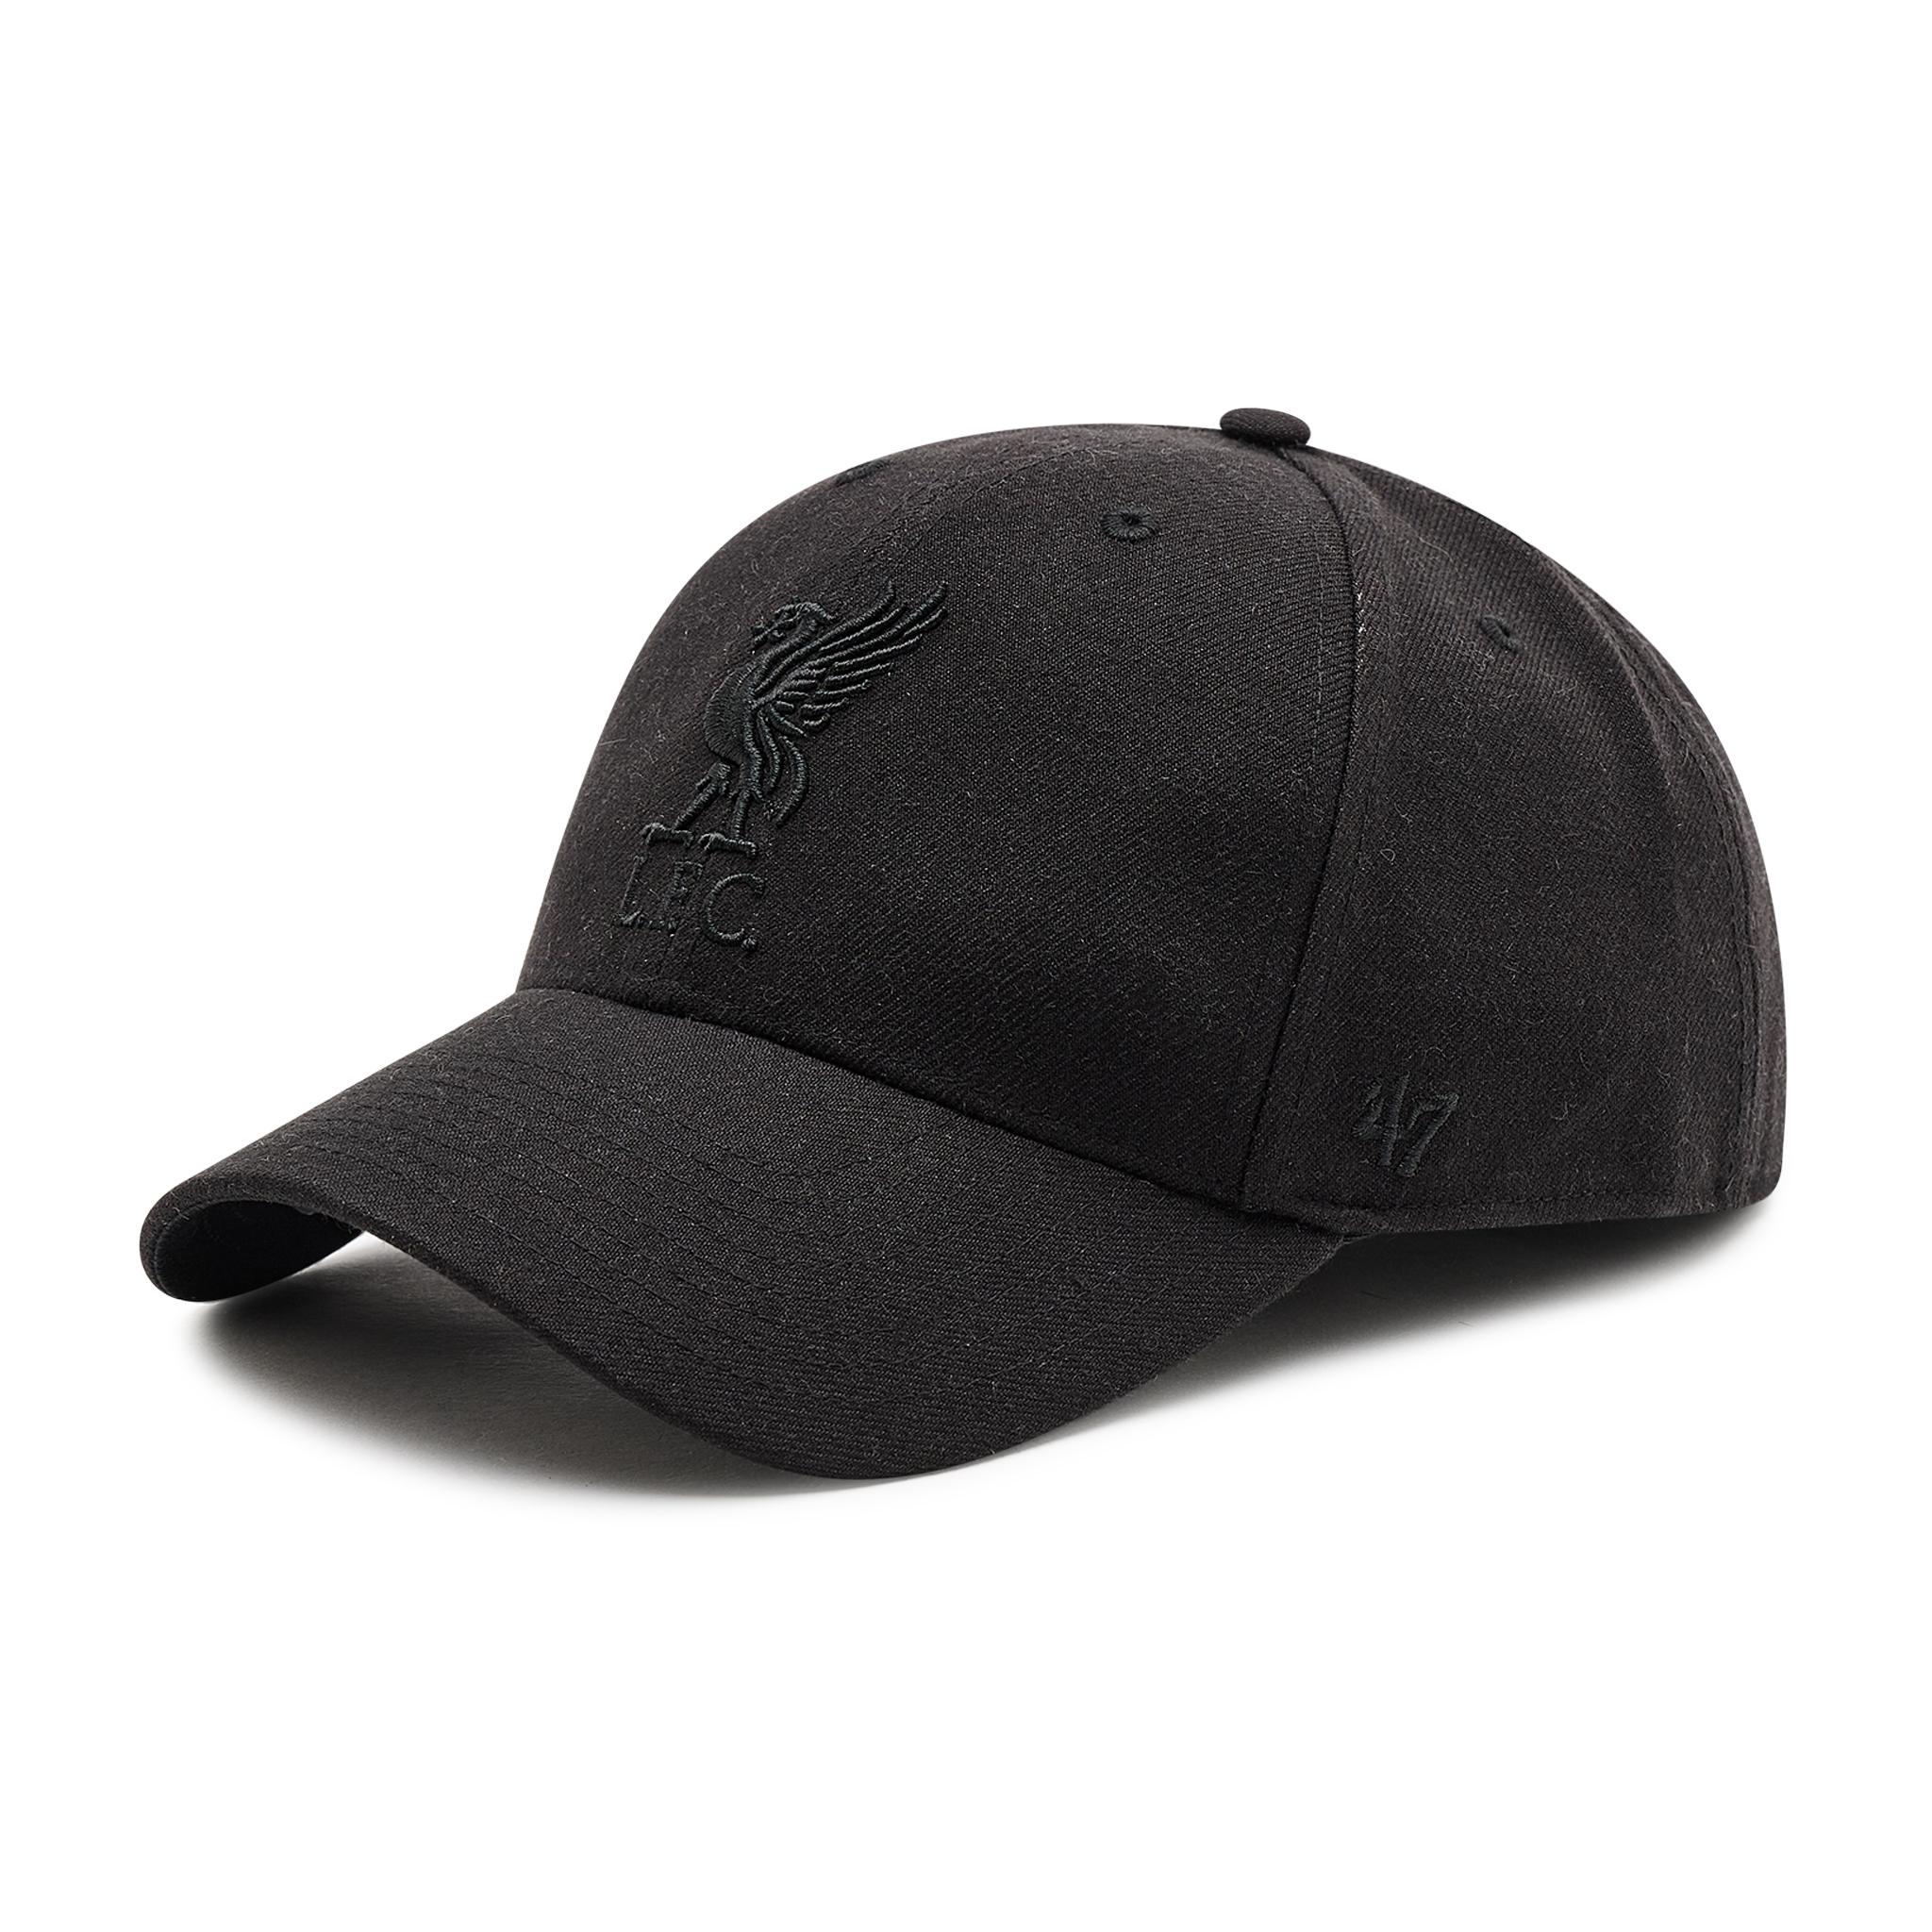 Image of Cap 47 BRAND - Adjustable Cap Liverpool MVPSP04WBP-BK Black